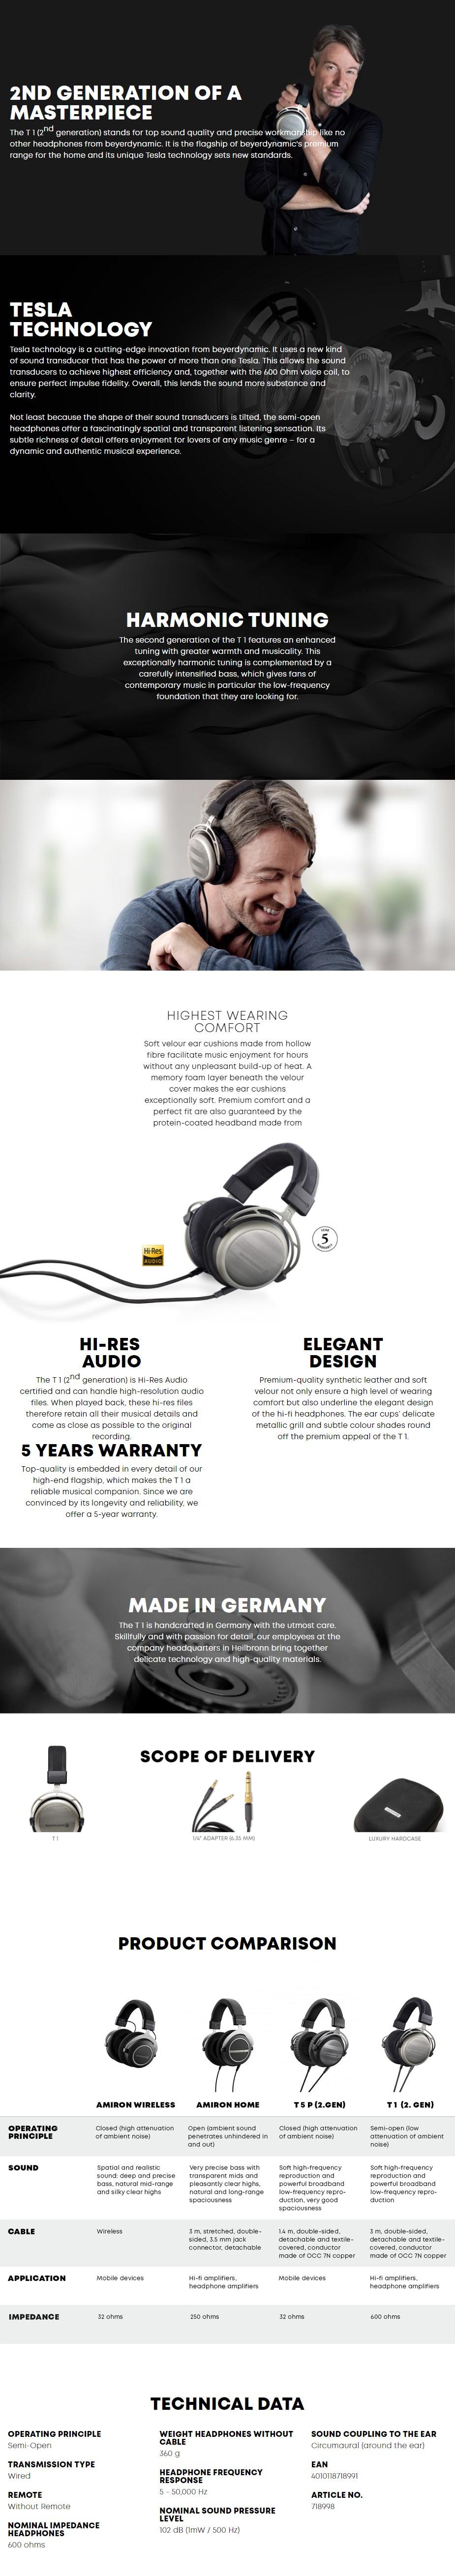 Beyerdynamic T1 Audiophile Semi-Open Hi-Fi Headphones - 2nd Generation - Overview 1